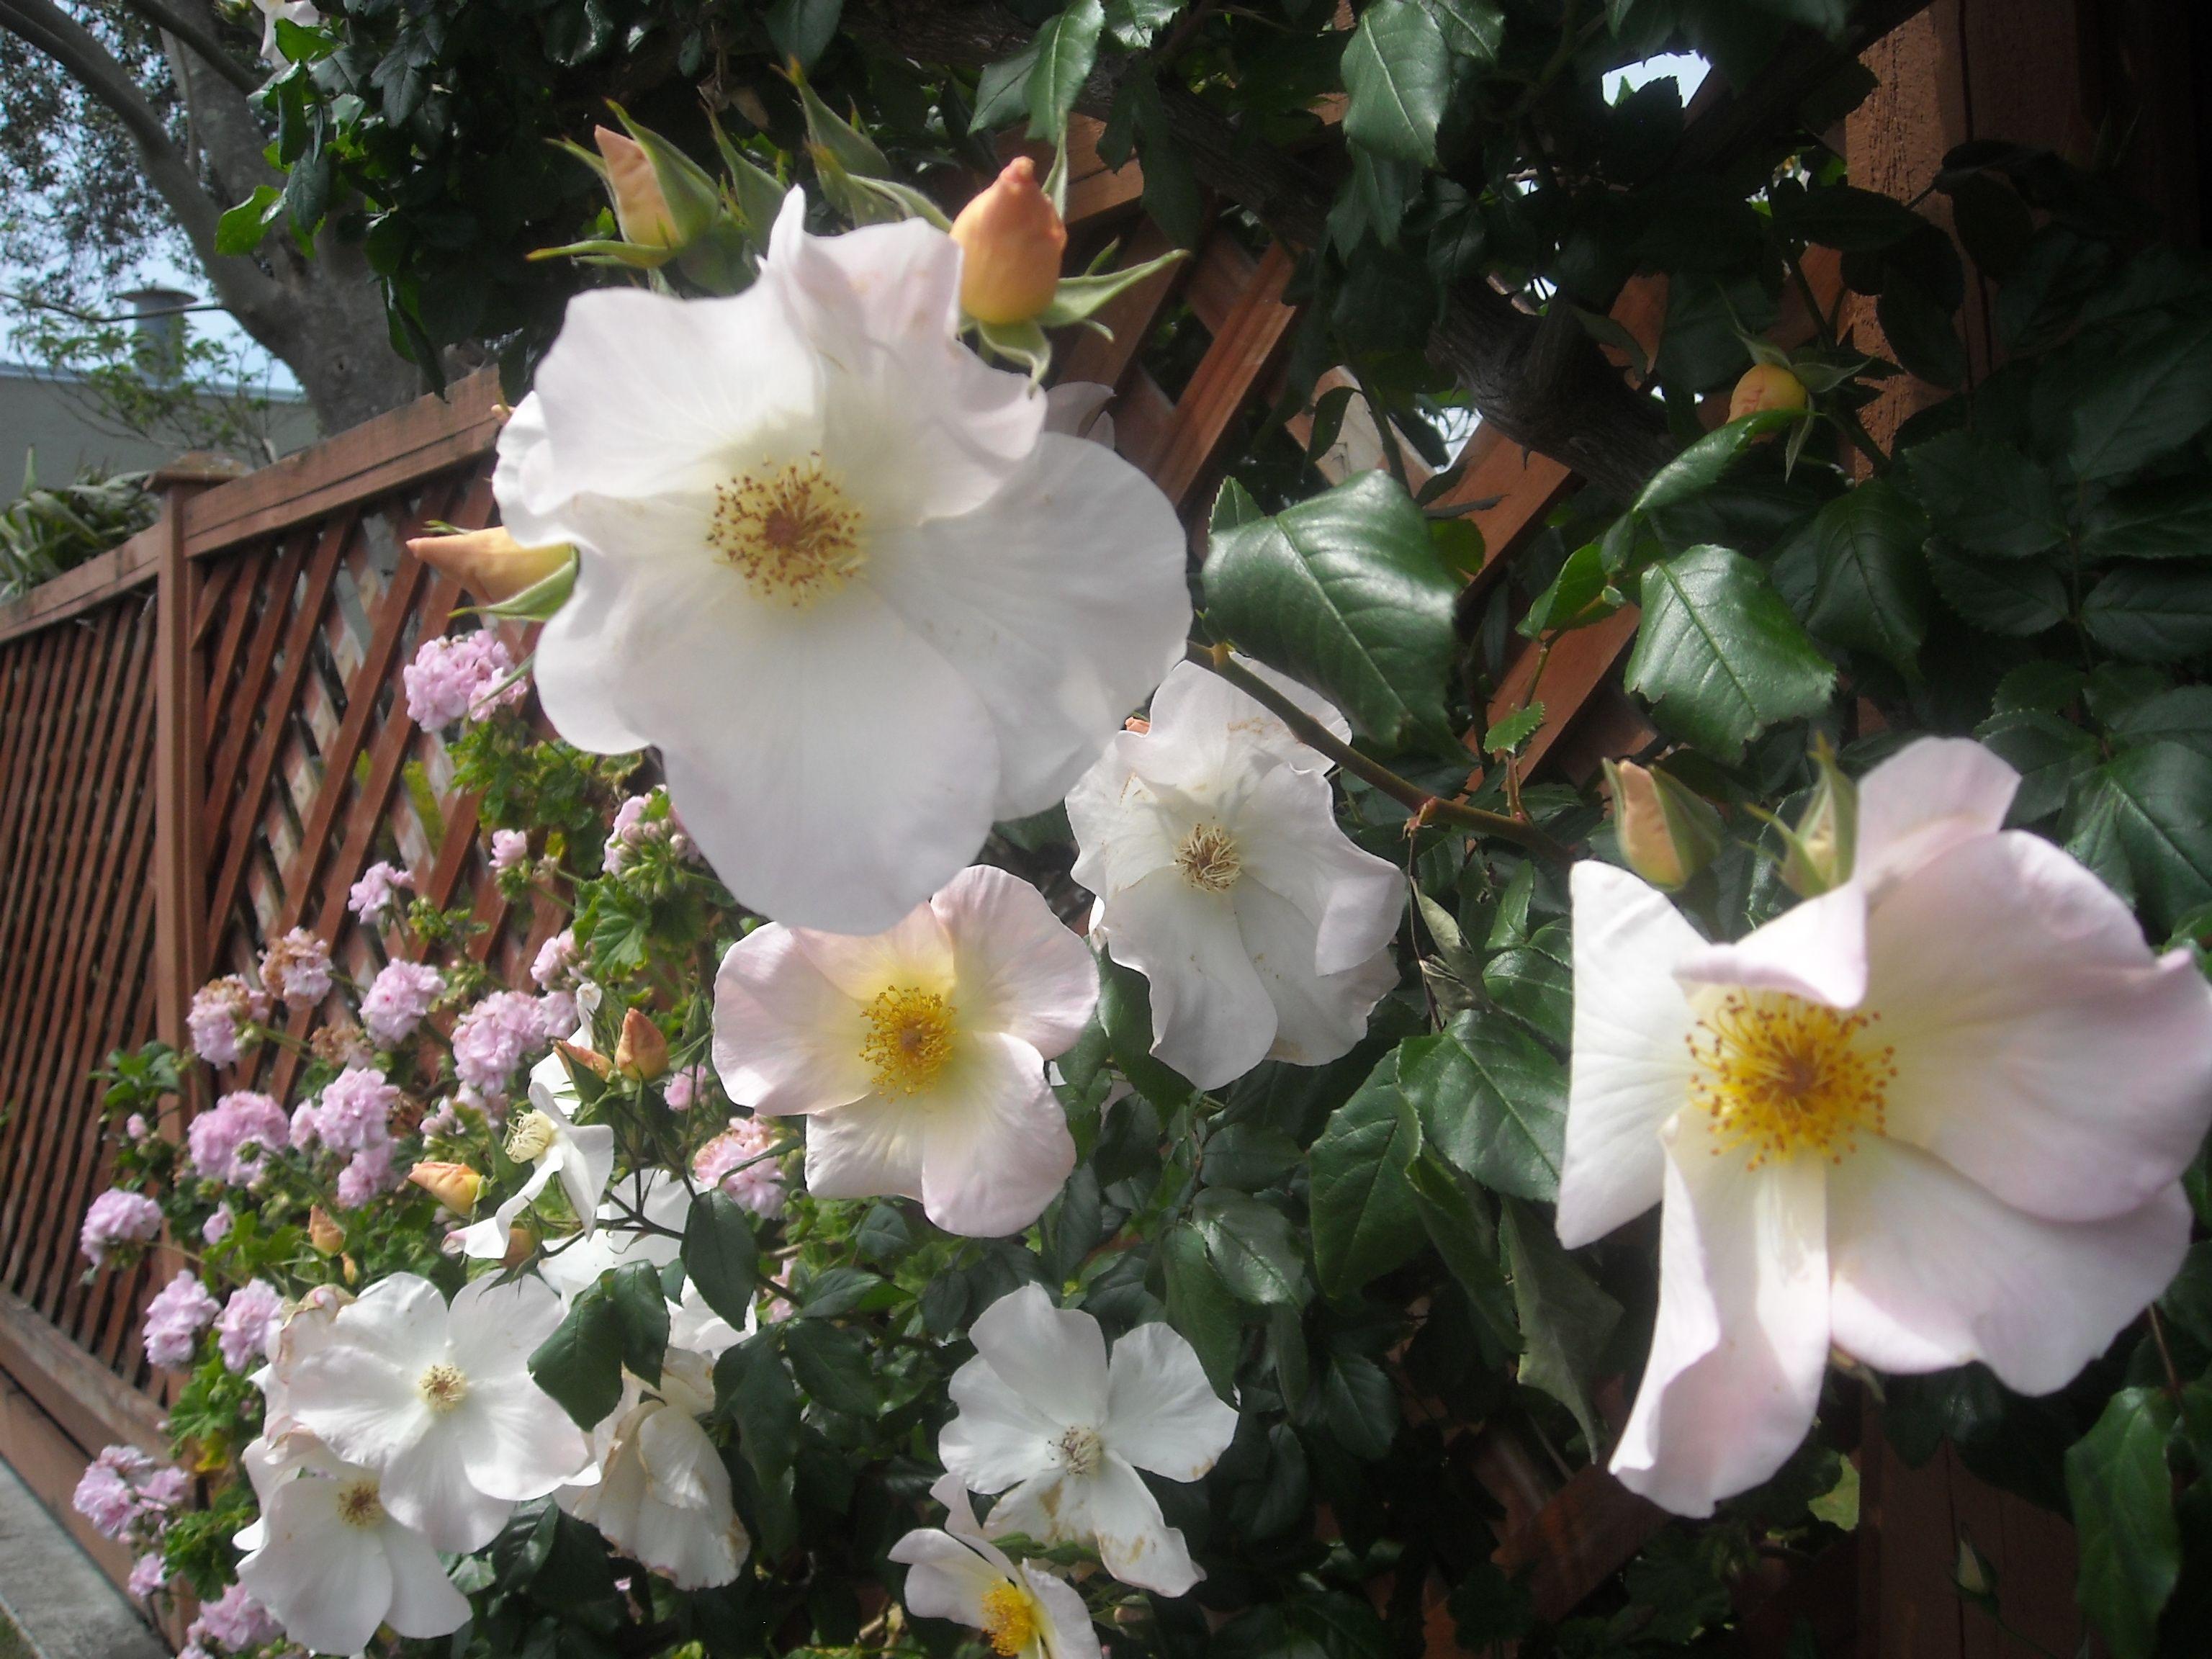 Flowers In Childers Road Elgin Gisborne New Zealand